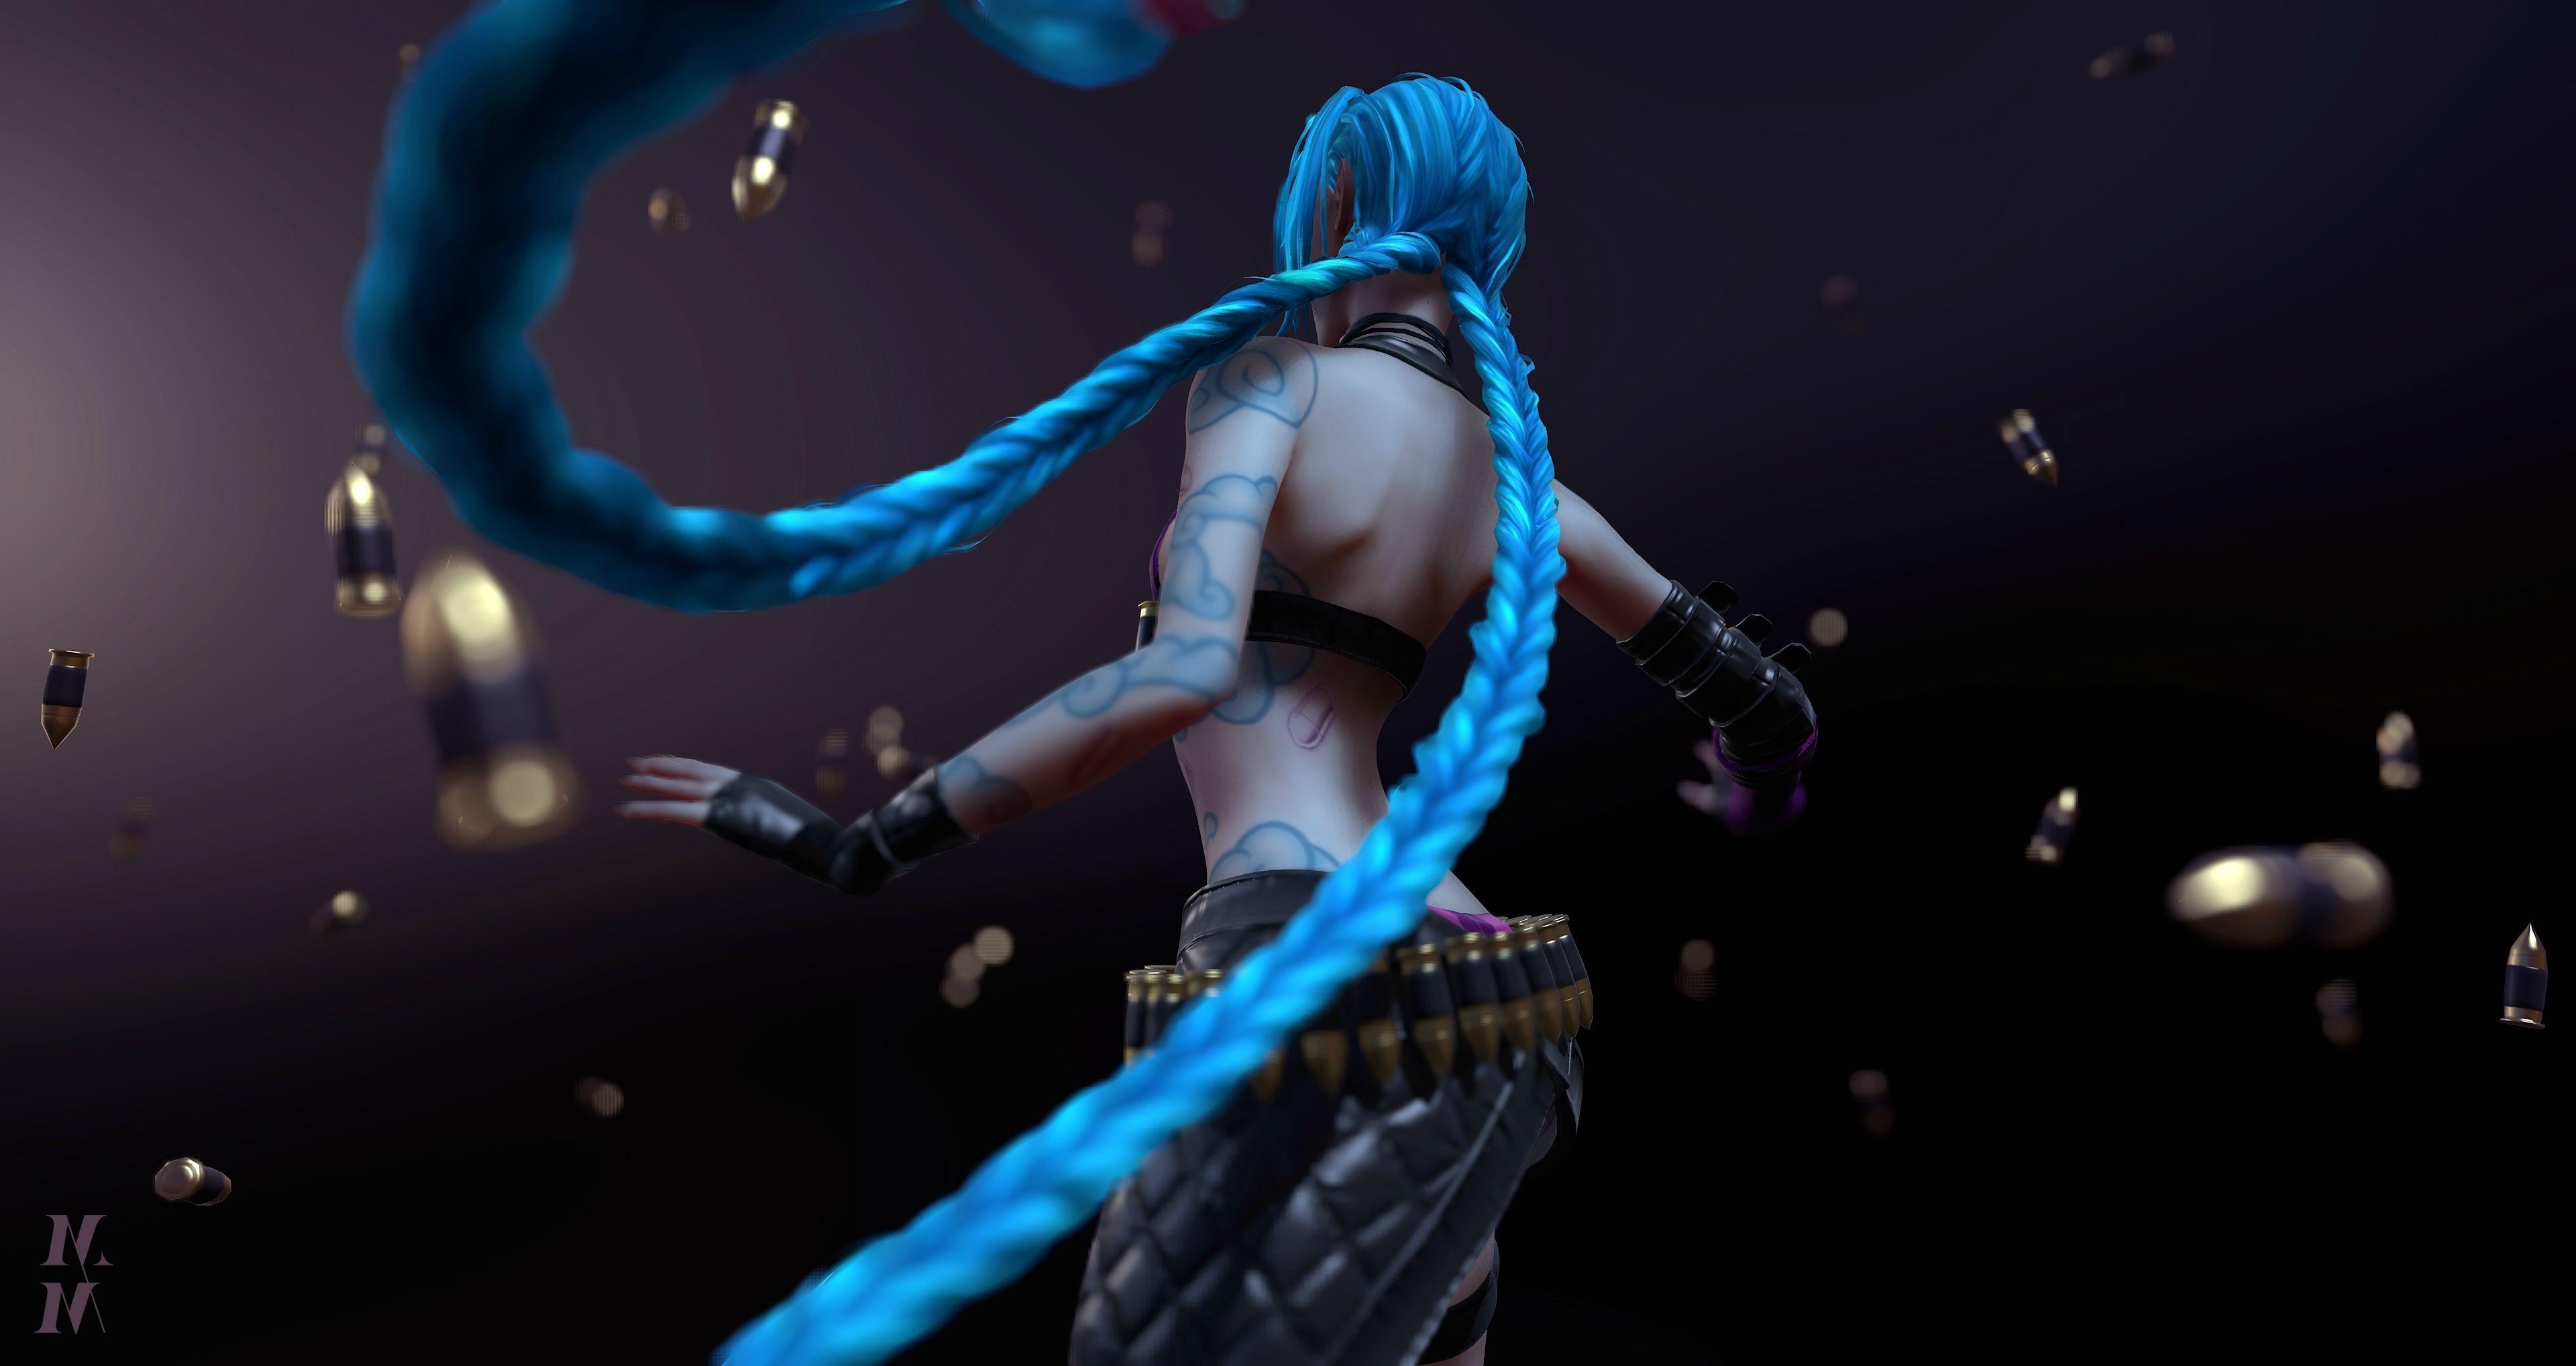 blue Hair, CGI, Women, League Of Legends, Jinx (League Of Legends)  Wallpapers HD / Desktop and Mobile Backgrounds